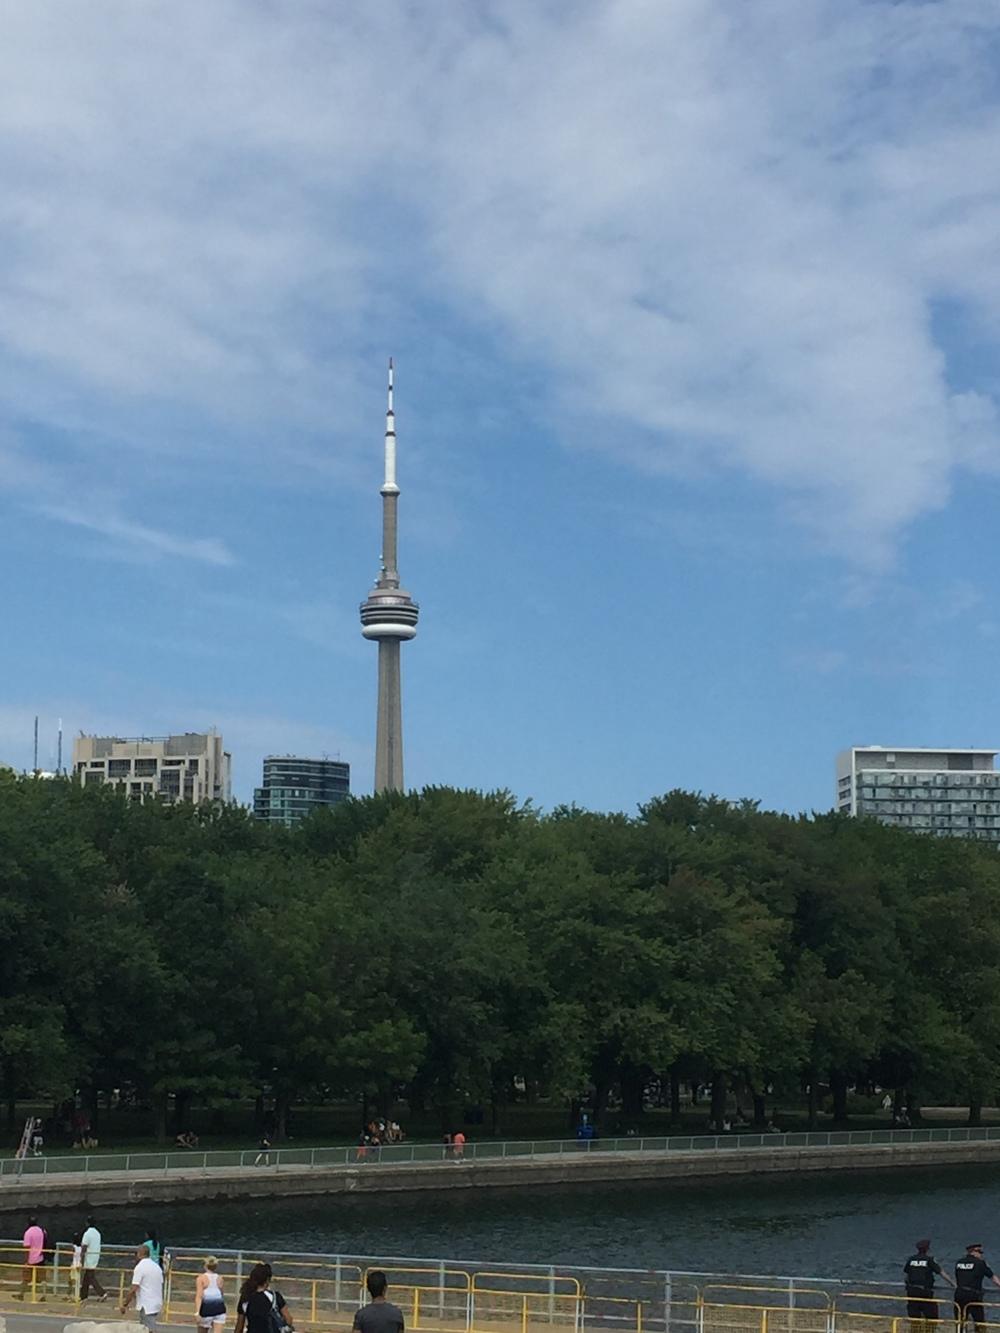 Toronto, the greatest city on earth! #CNTower